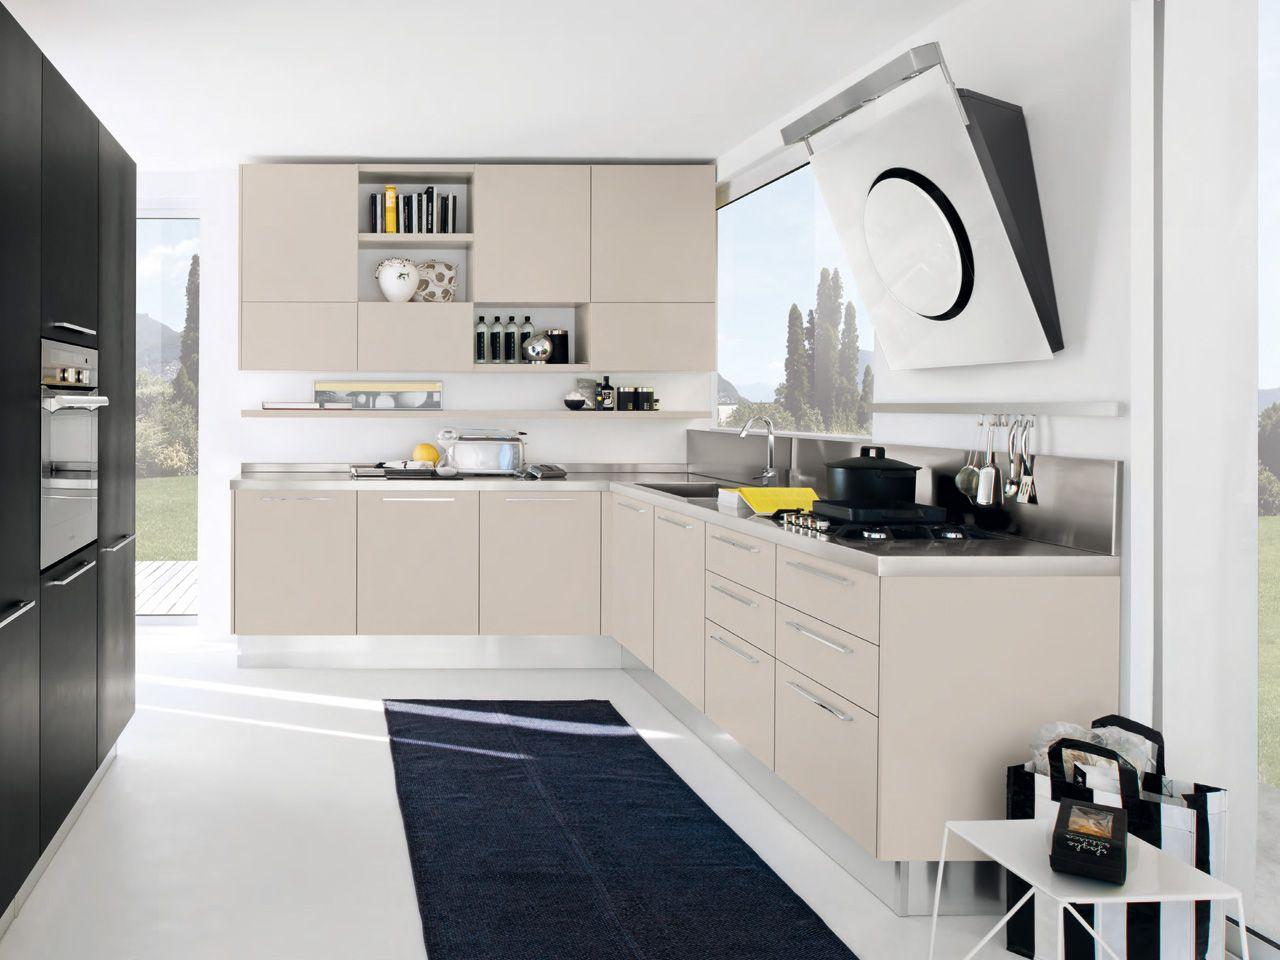 pamela cuisine suspendue by cucine lube. Black Bedroom Furniture Sets. Home Design Ideas